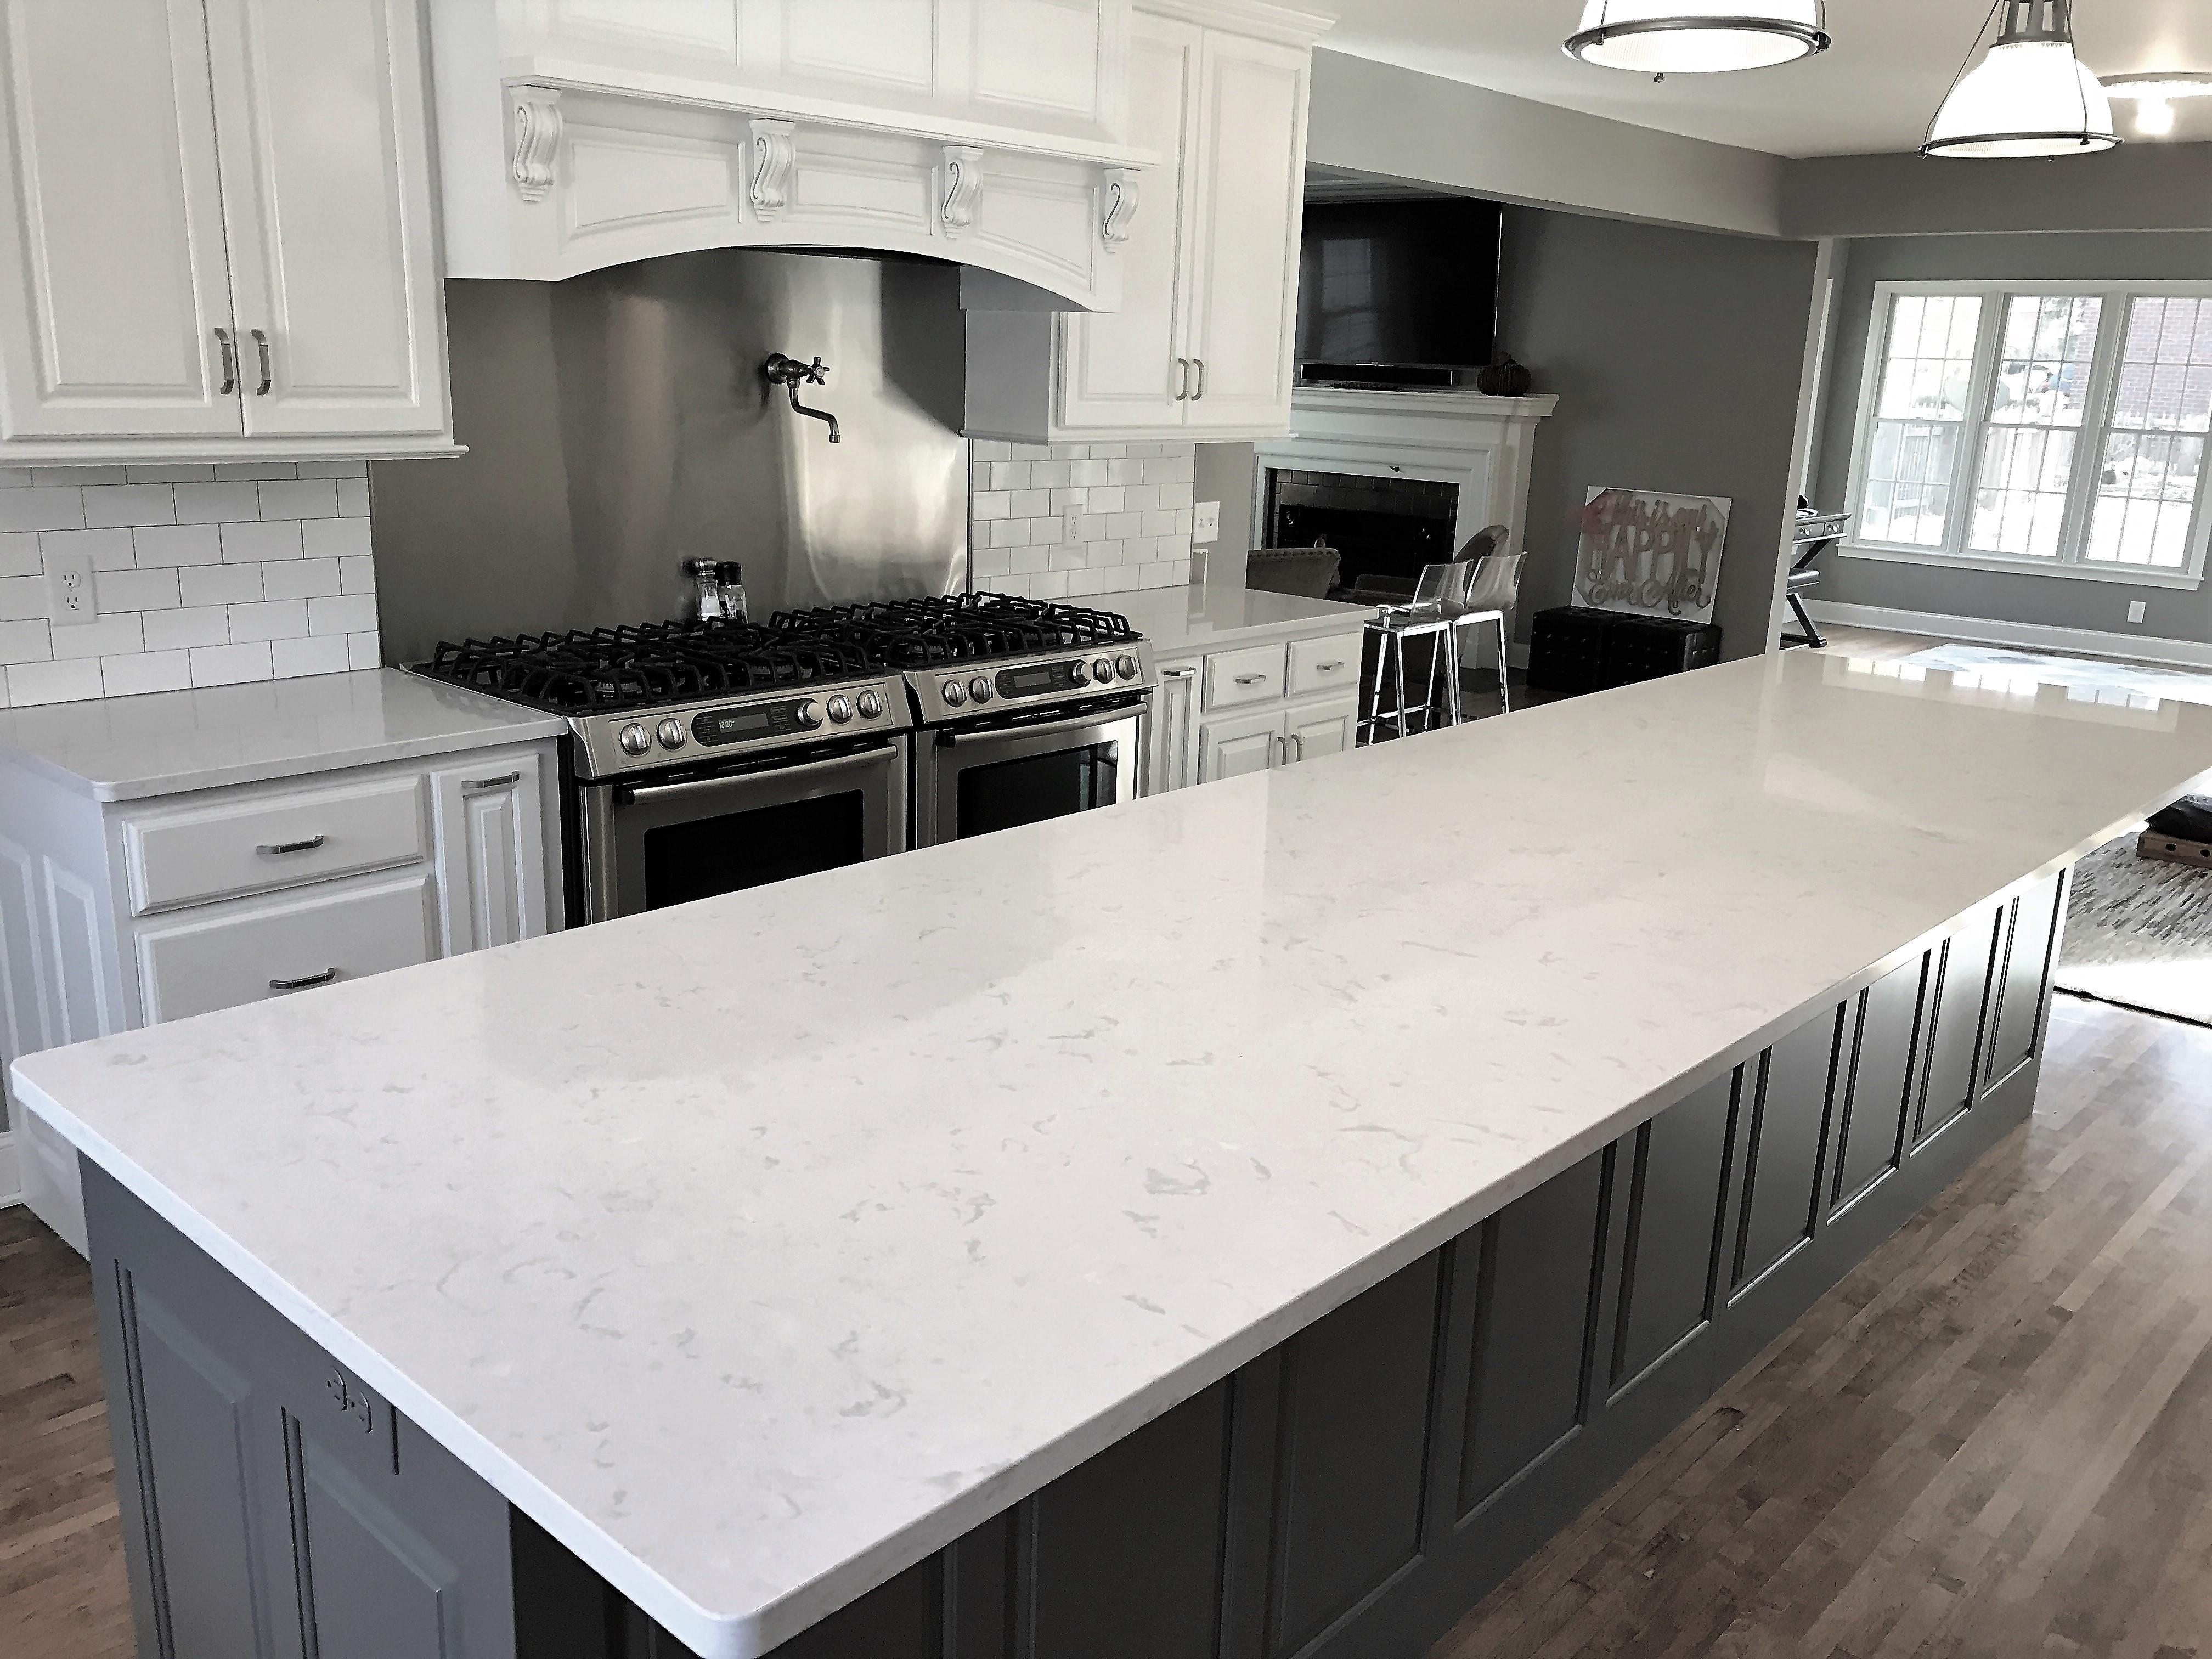 KraftMaid Beautiful cabinets for kitchen amp bathroom designs